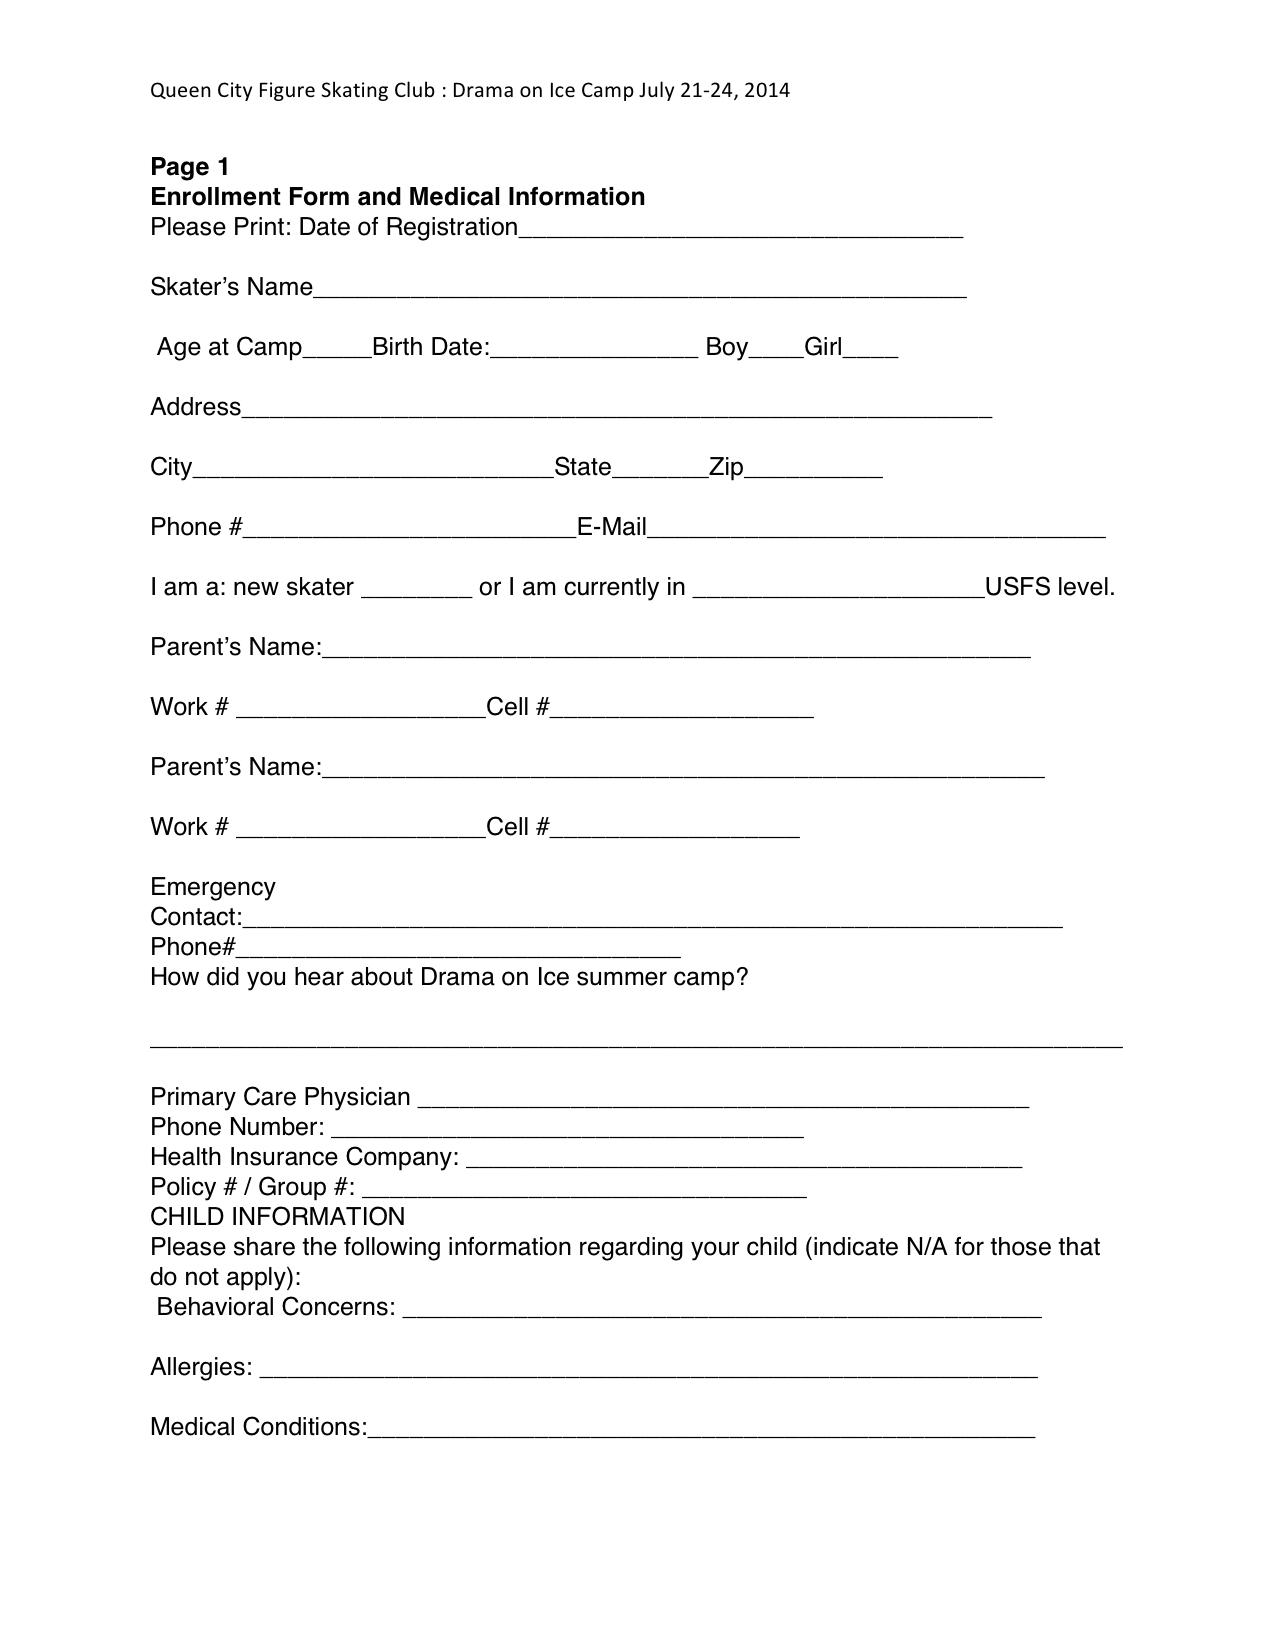 enrollmentform_dramaonice_pg01